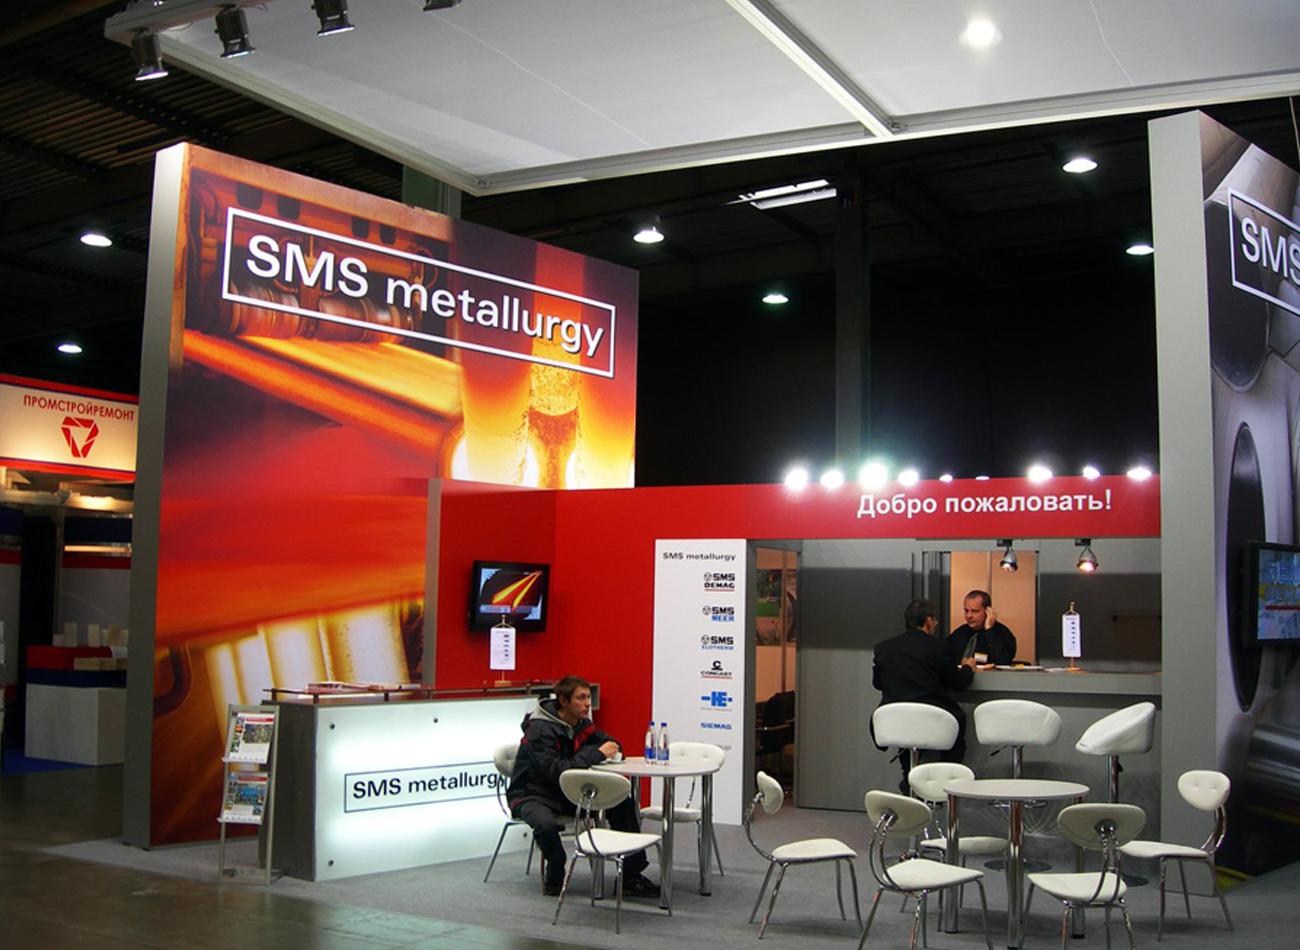 sms_metallurgy